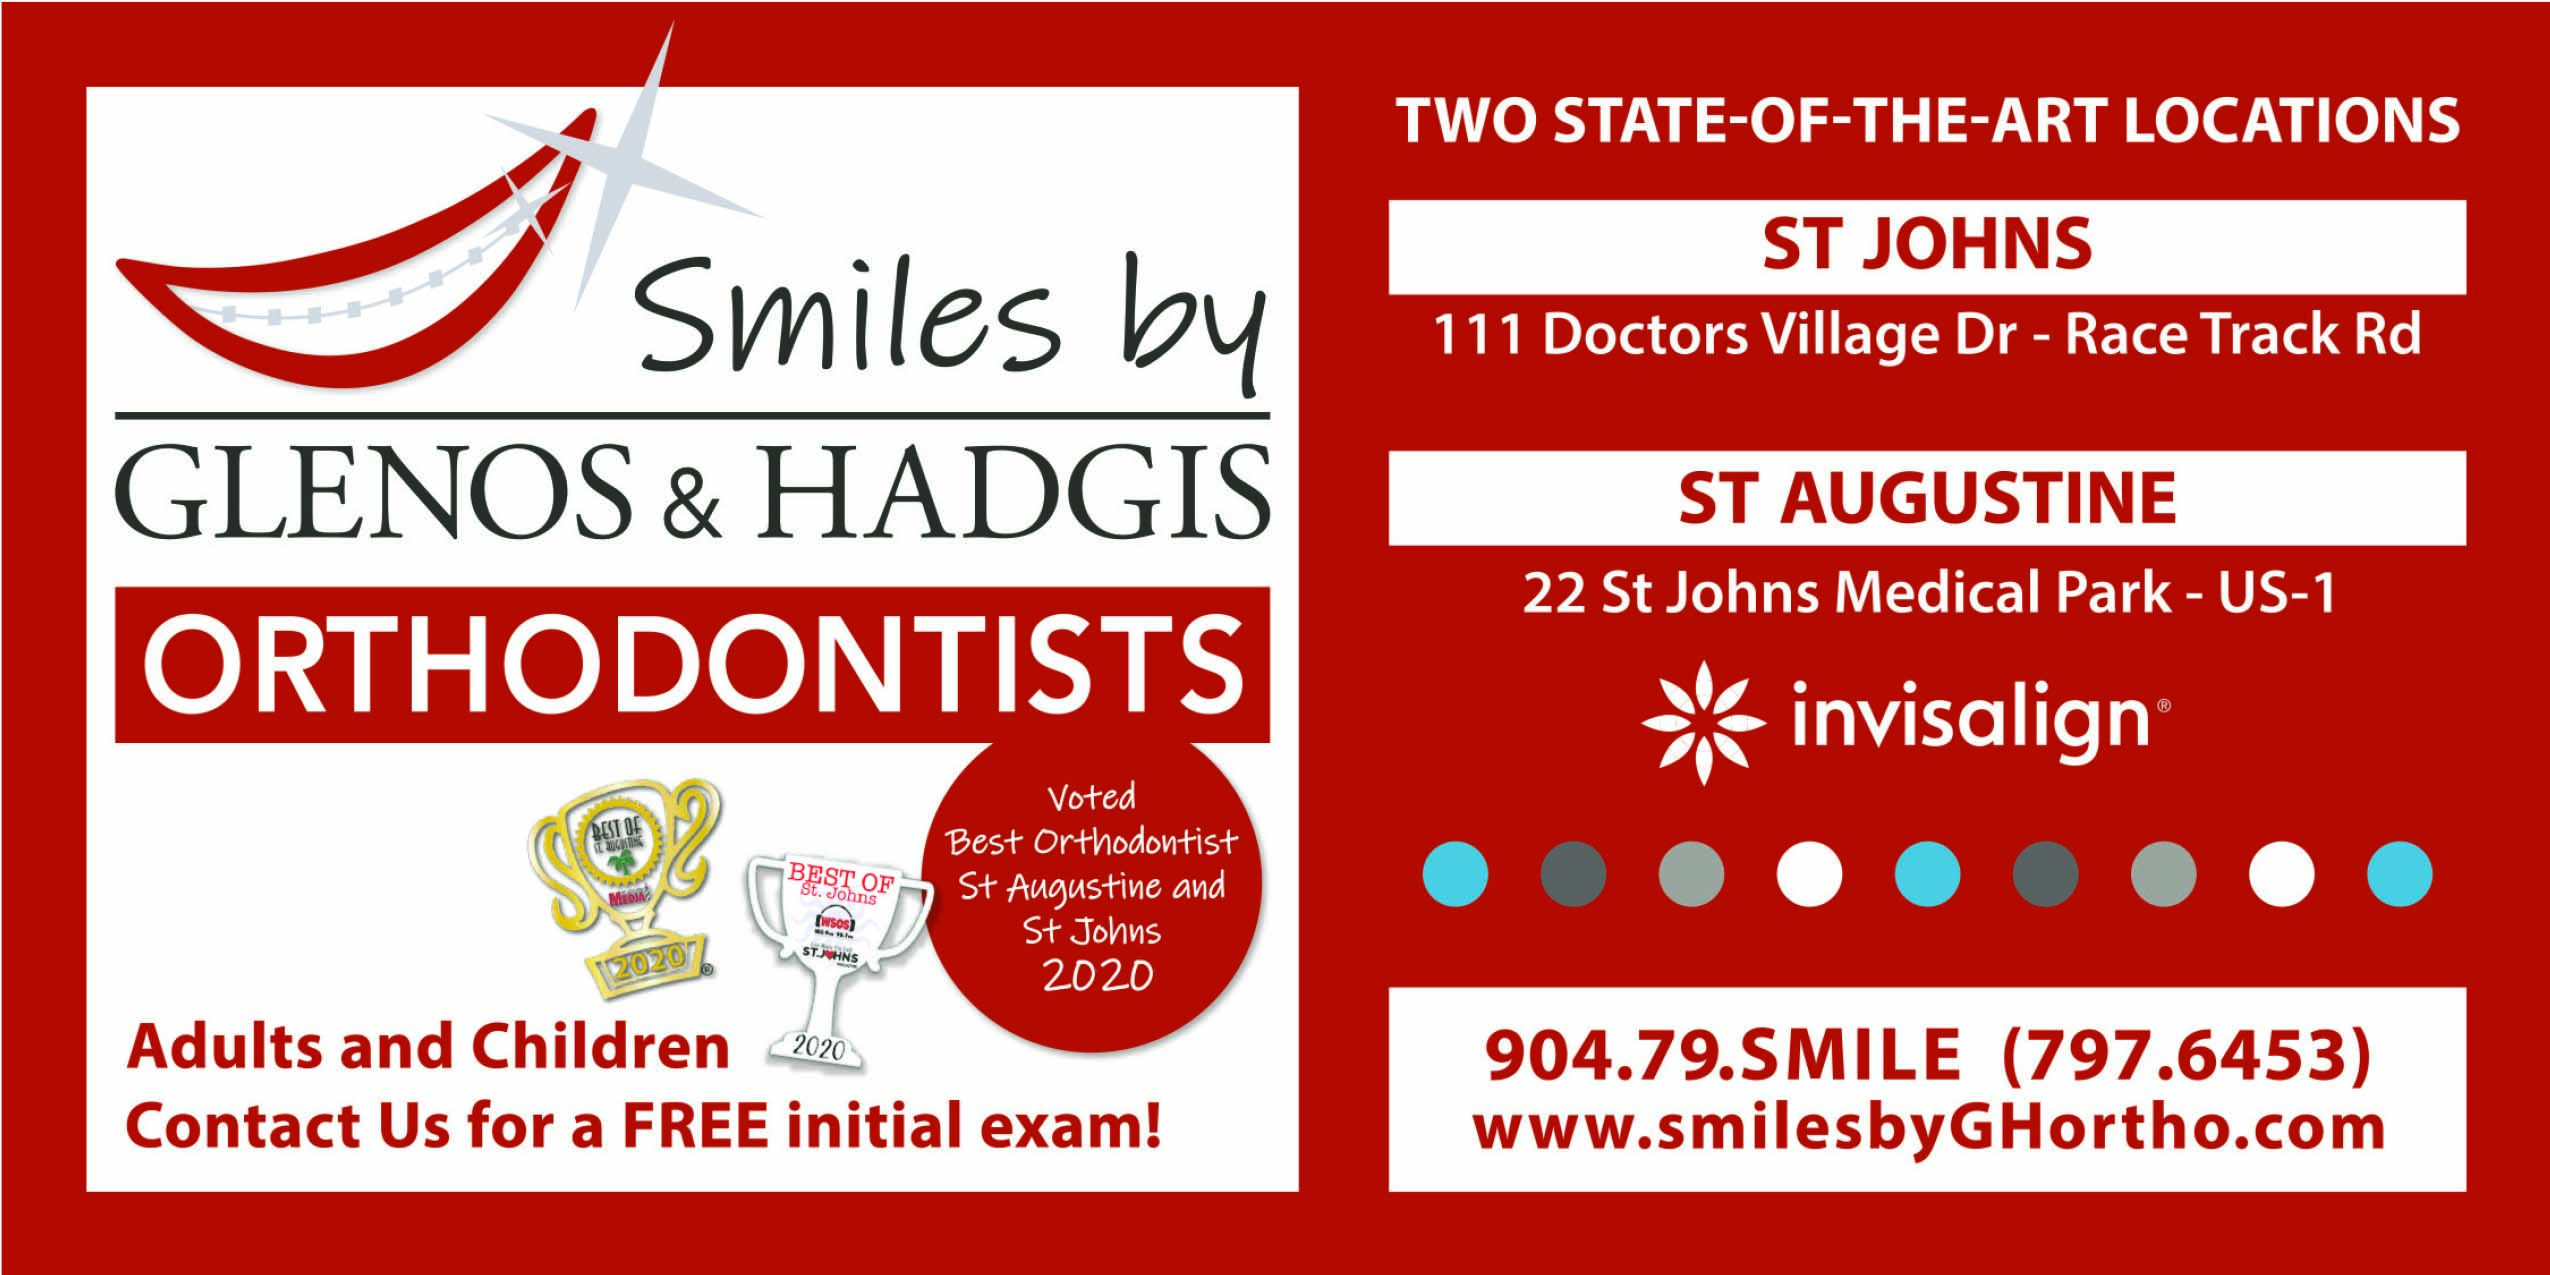 Smiles by Glenos & Hadfic Orthodontists